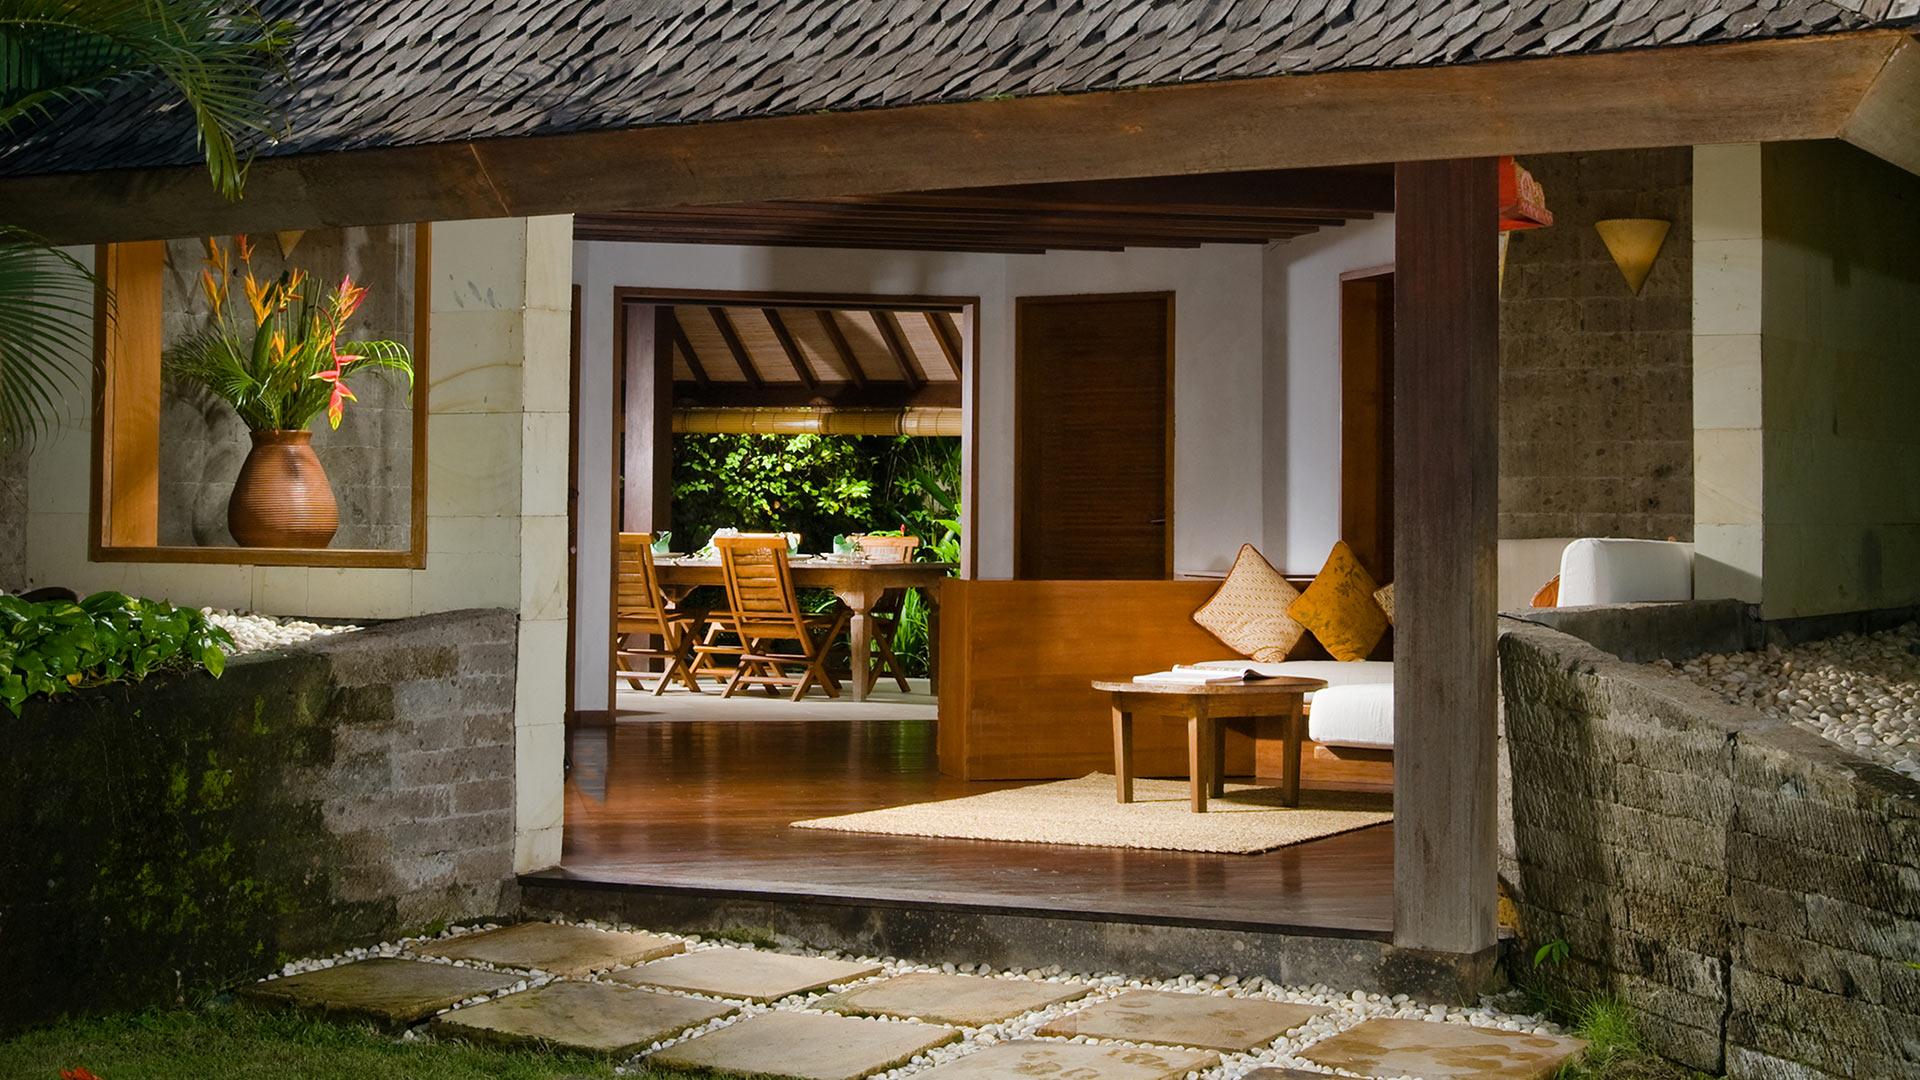 Villa Bali-Bali Cottage, Location à Bali